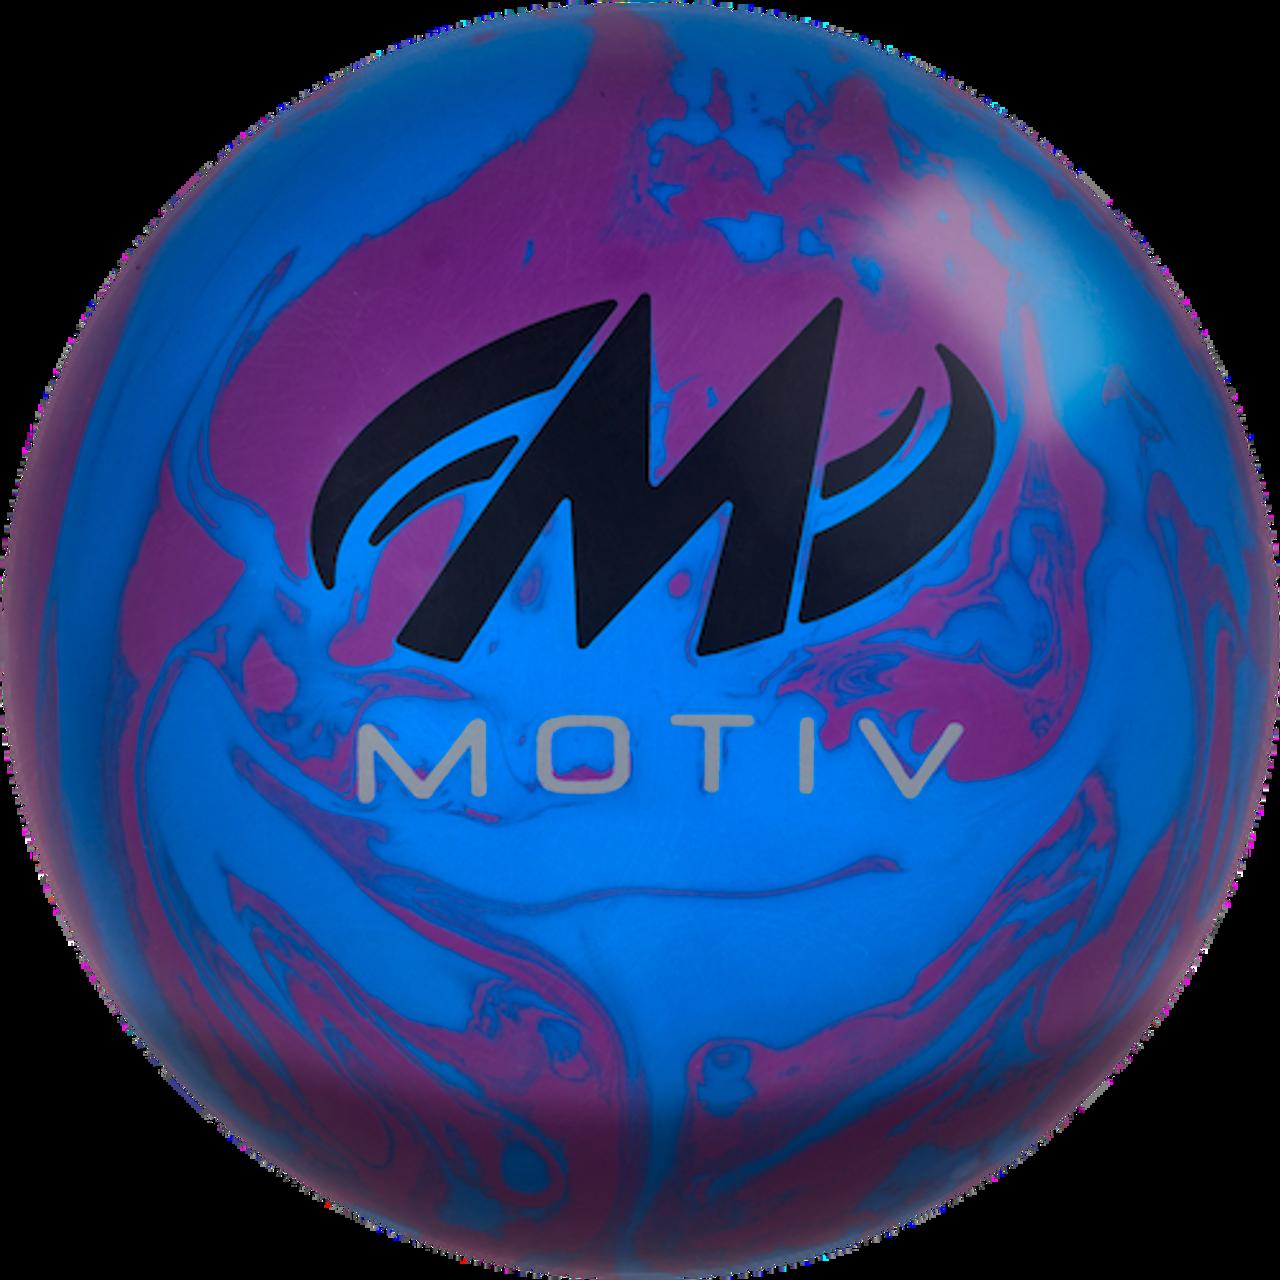 Motiv Alpha Jackal Bowling Ball Logo